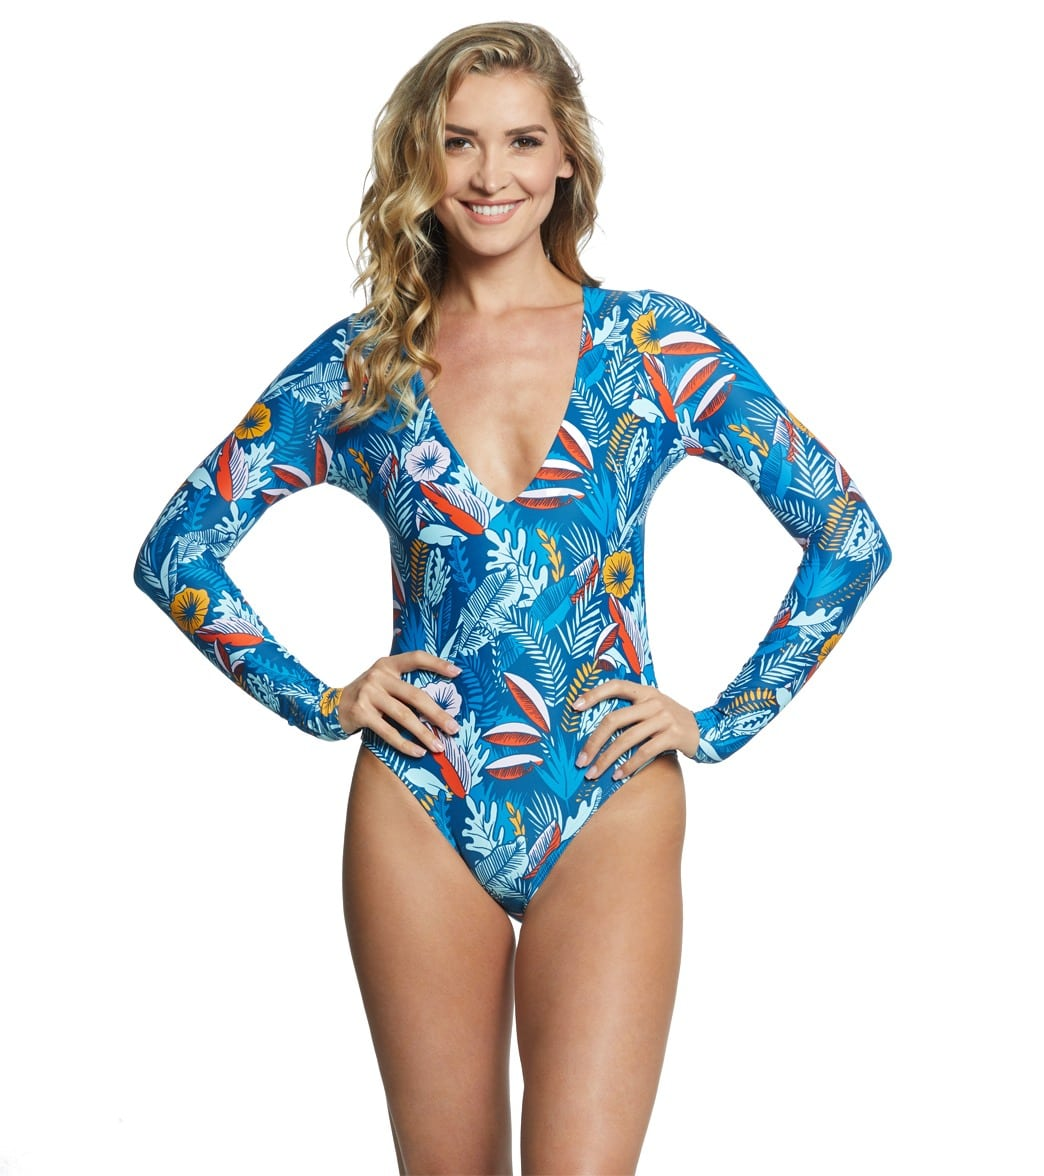 66e9c4daa2 Speedo Valentina Long Sleeve One Piece Swimsuit at SwimOutlet.com ...